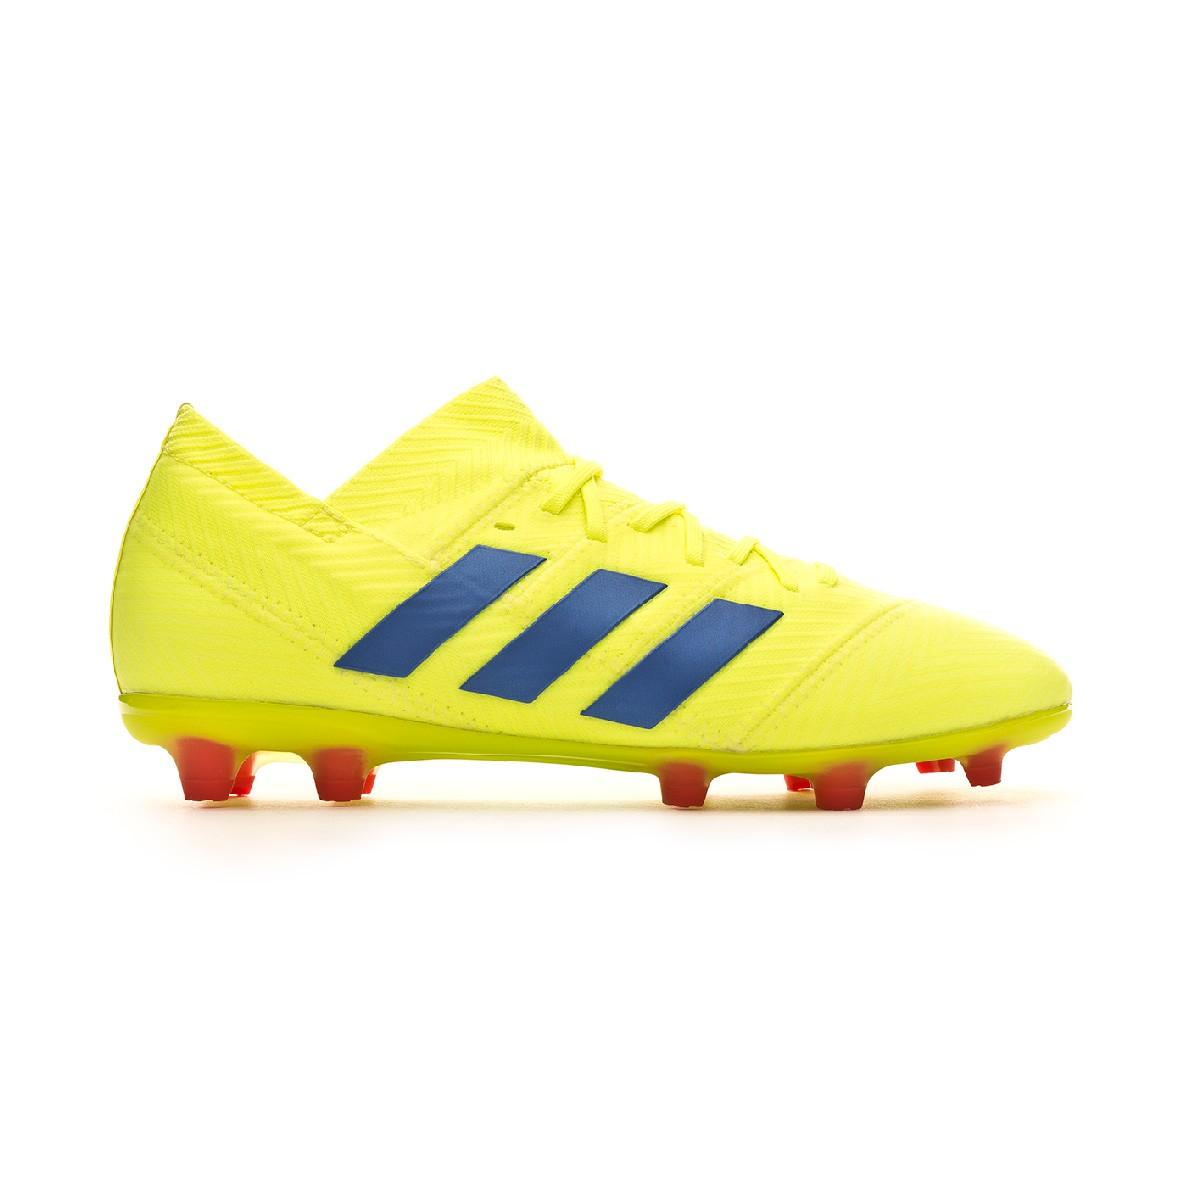 best website 12c92 d45c4 Football Boots adidas Kids Nemeziz 18.1 FG Solar yellow-Football blue-Active  red - Football store Fútbol Emotion